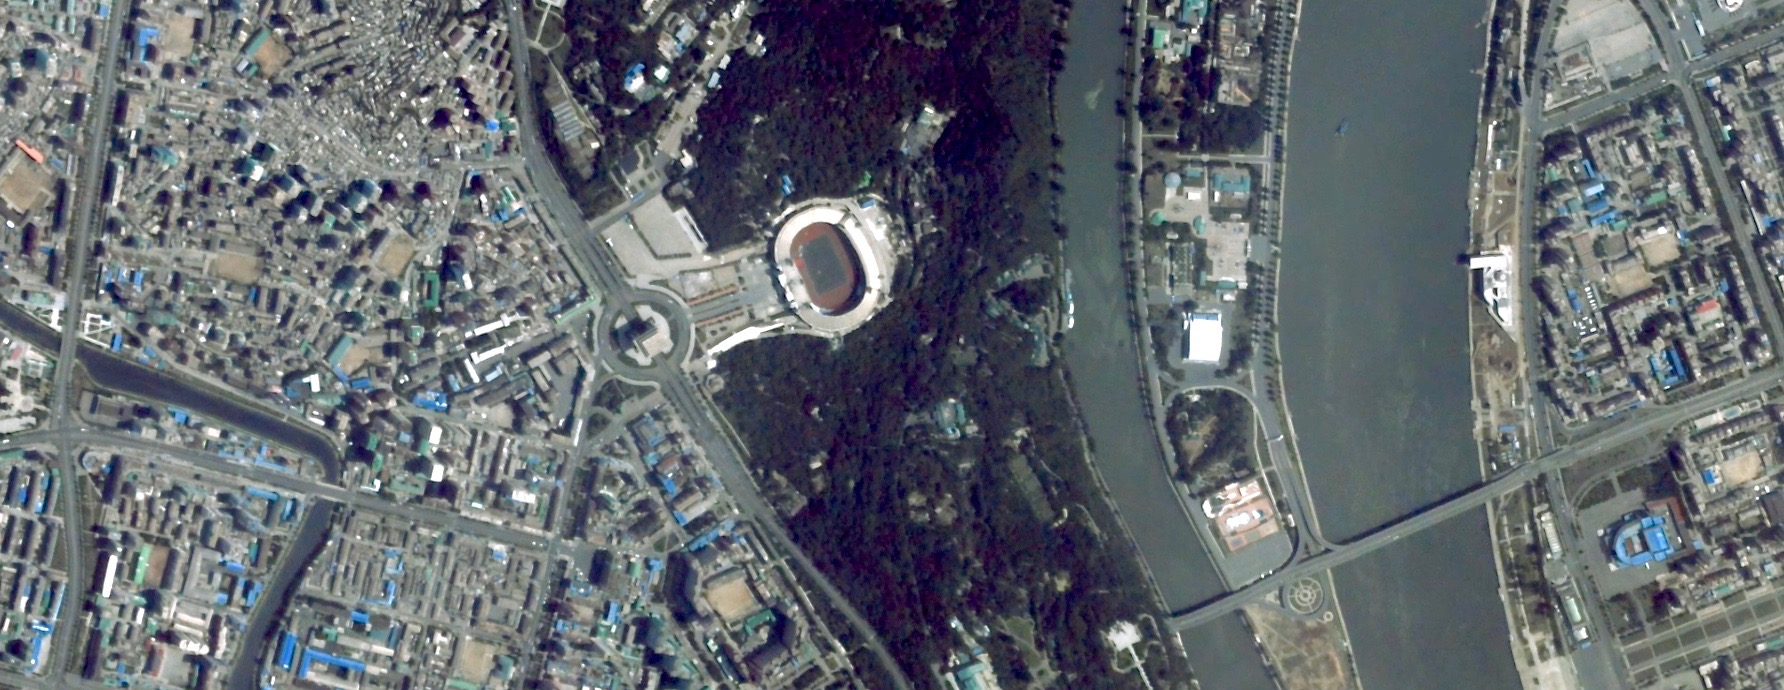 pyongyang_blog_header